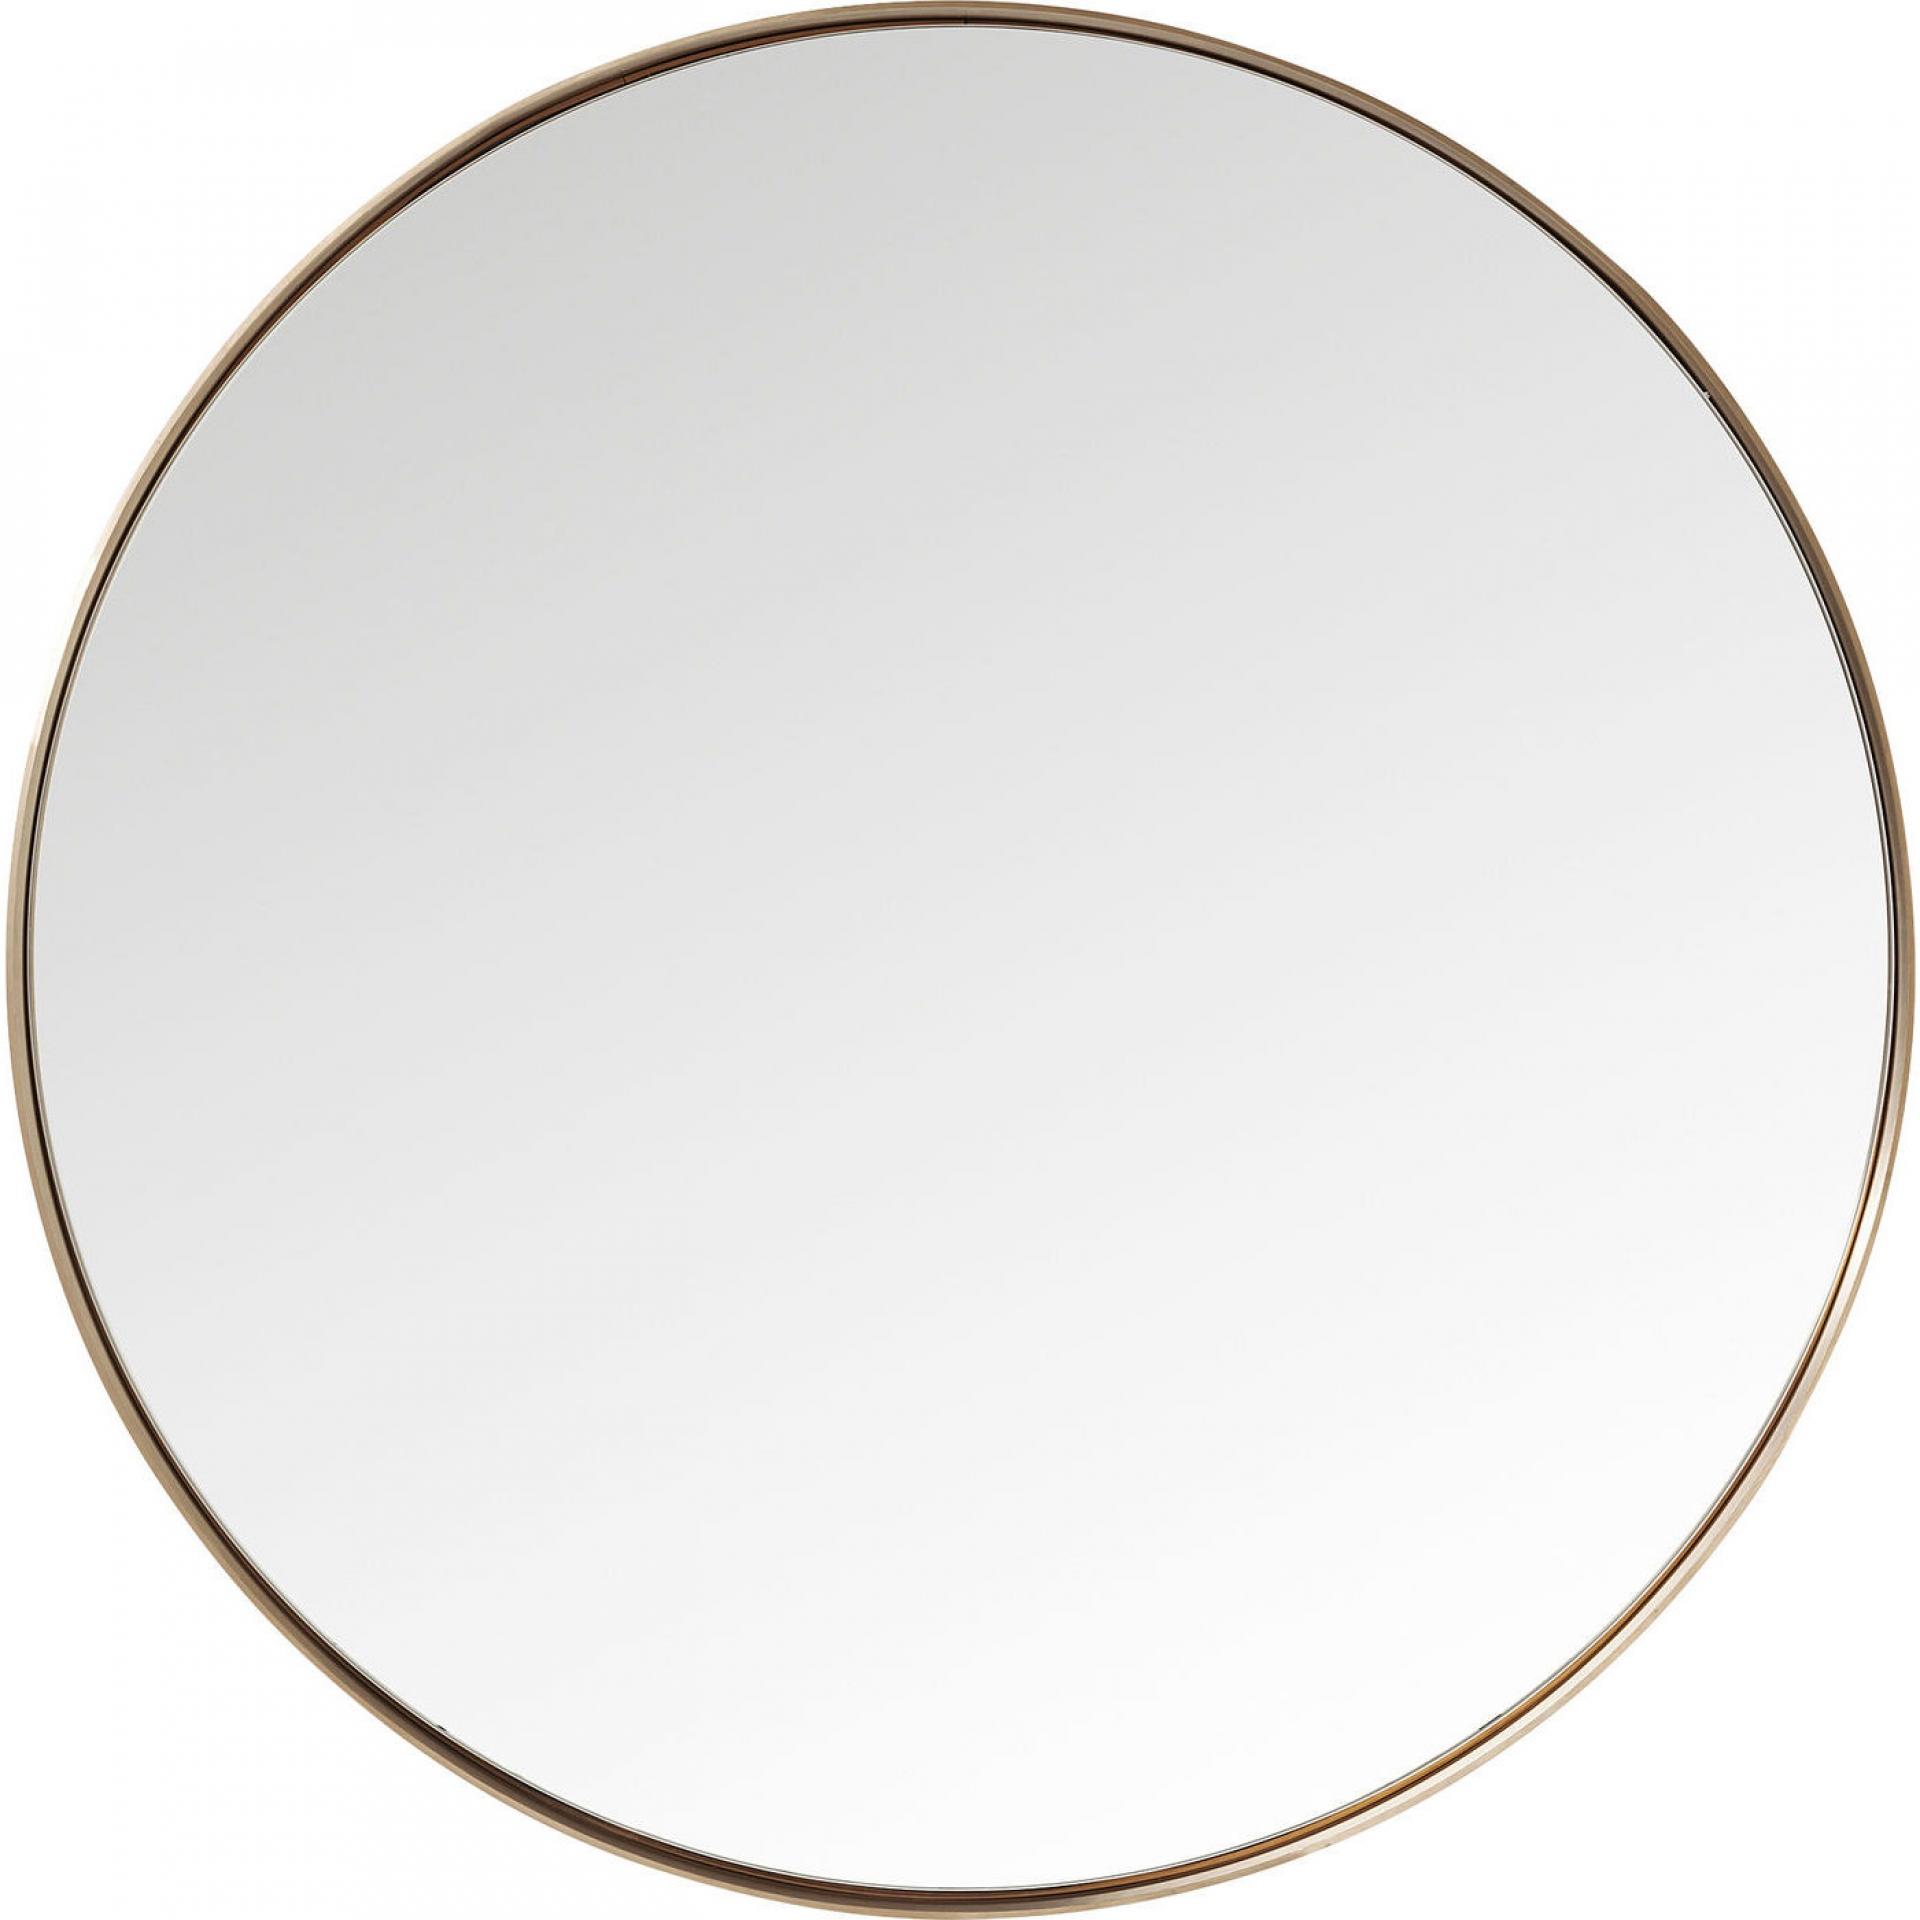 Kadeřnické zrcadlo Kare Curve Round - měděné (82716) + DÁREK ZDARMA